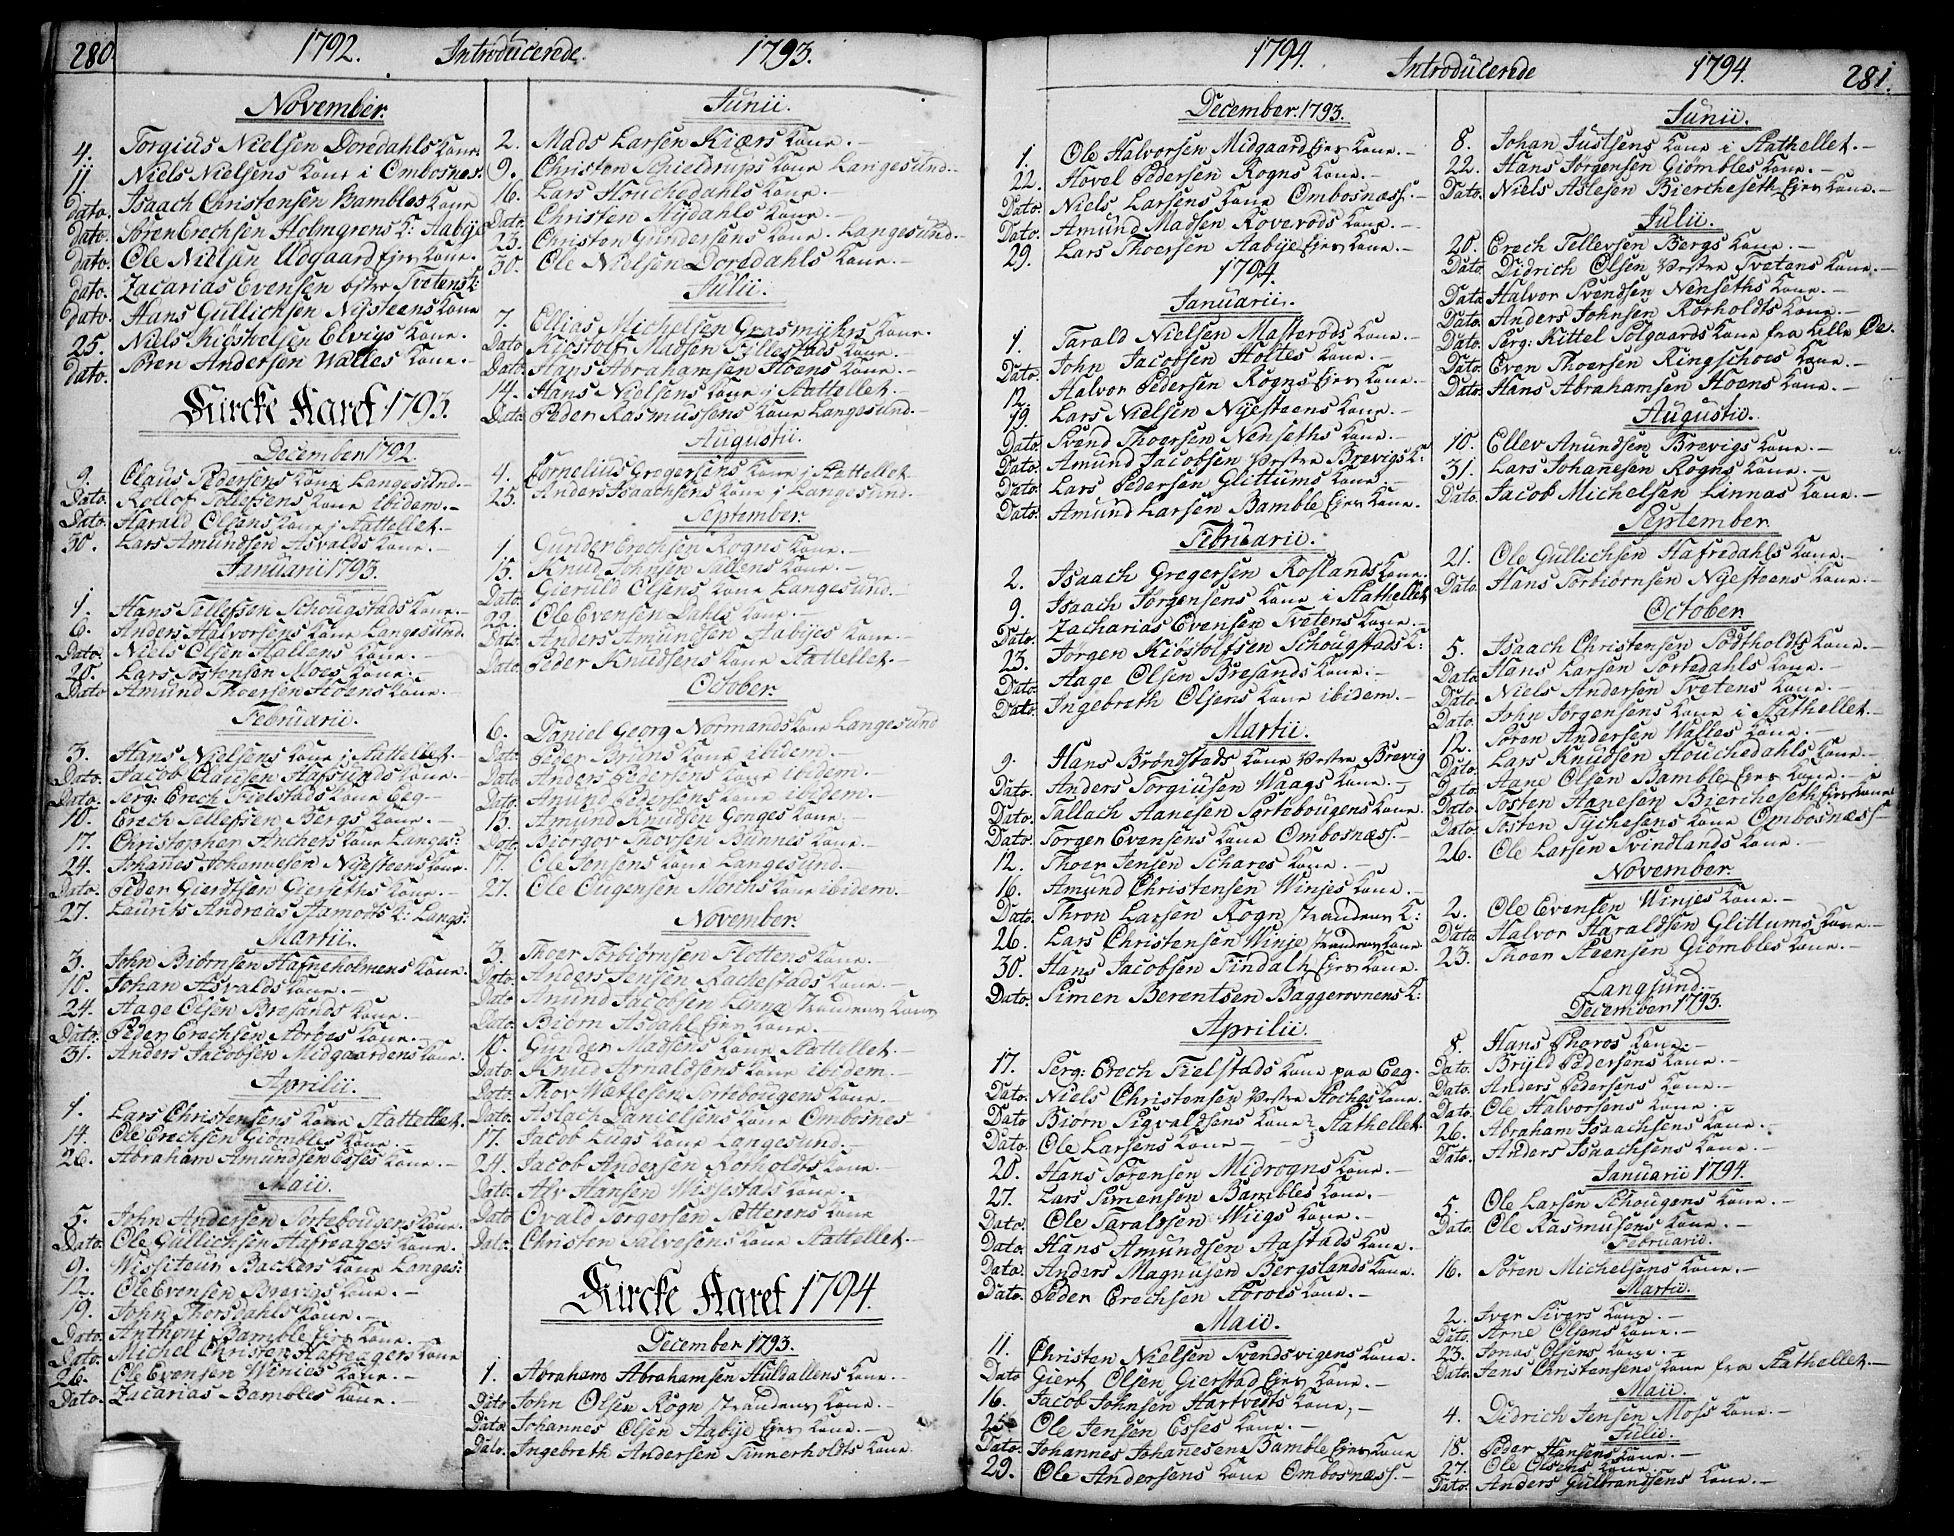 SAKO, Bamble kirkebøker, F/Fa/L0002: Ministerialbok nr. I 2, 1775-1814, s. 280-281